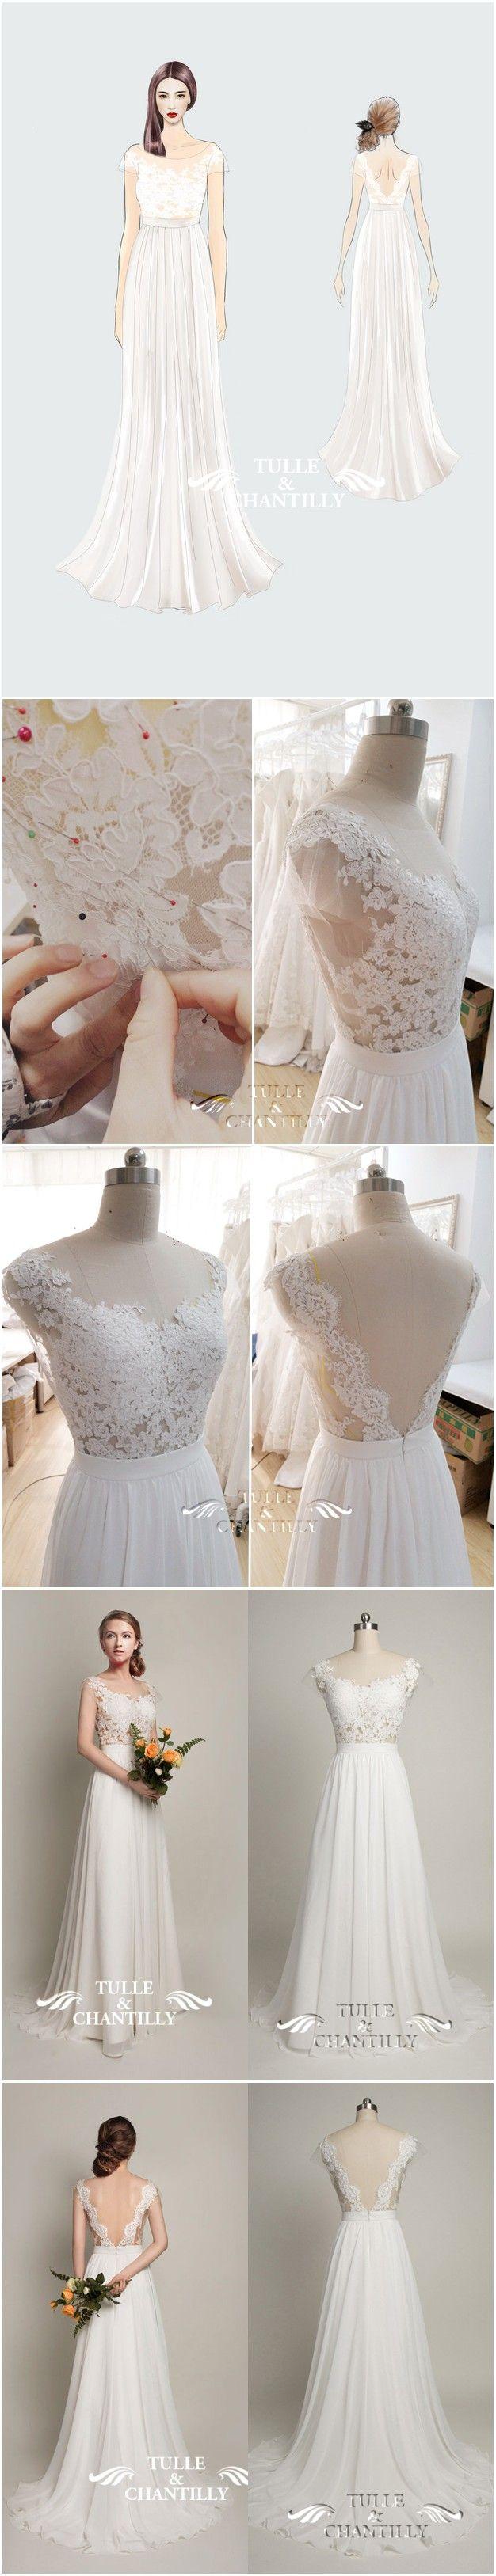 design your own wedding dress gorgeous customized long chiffon